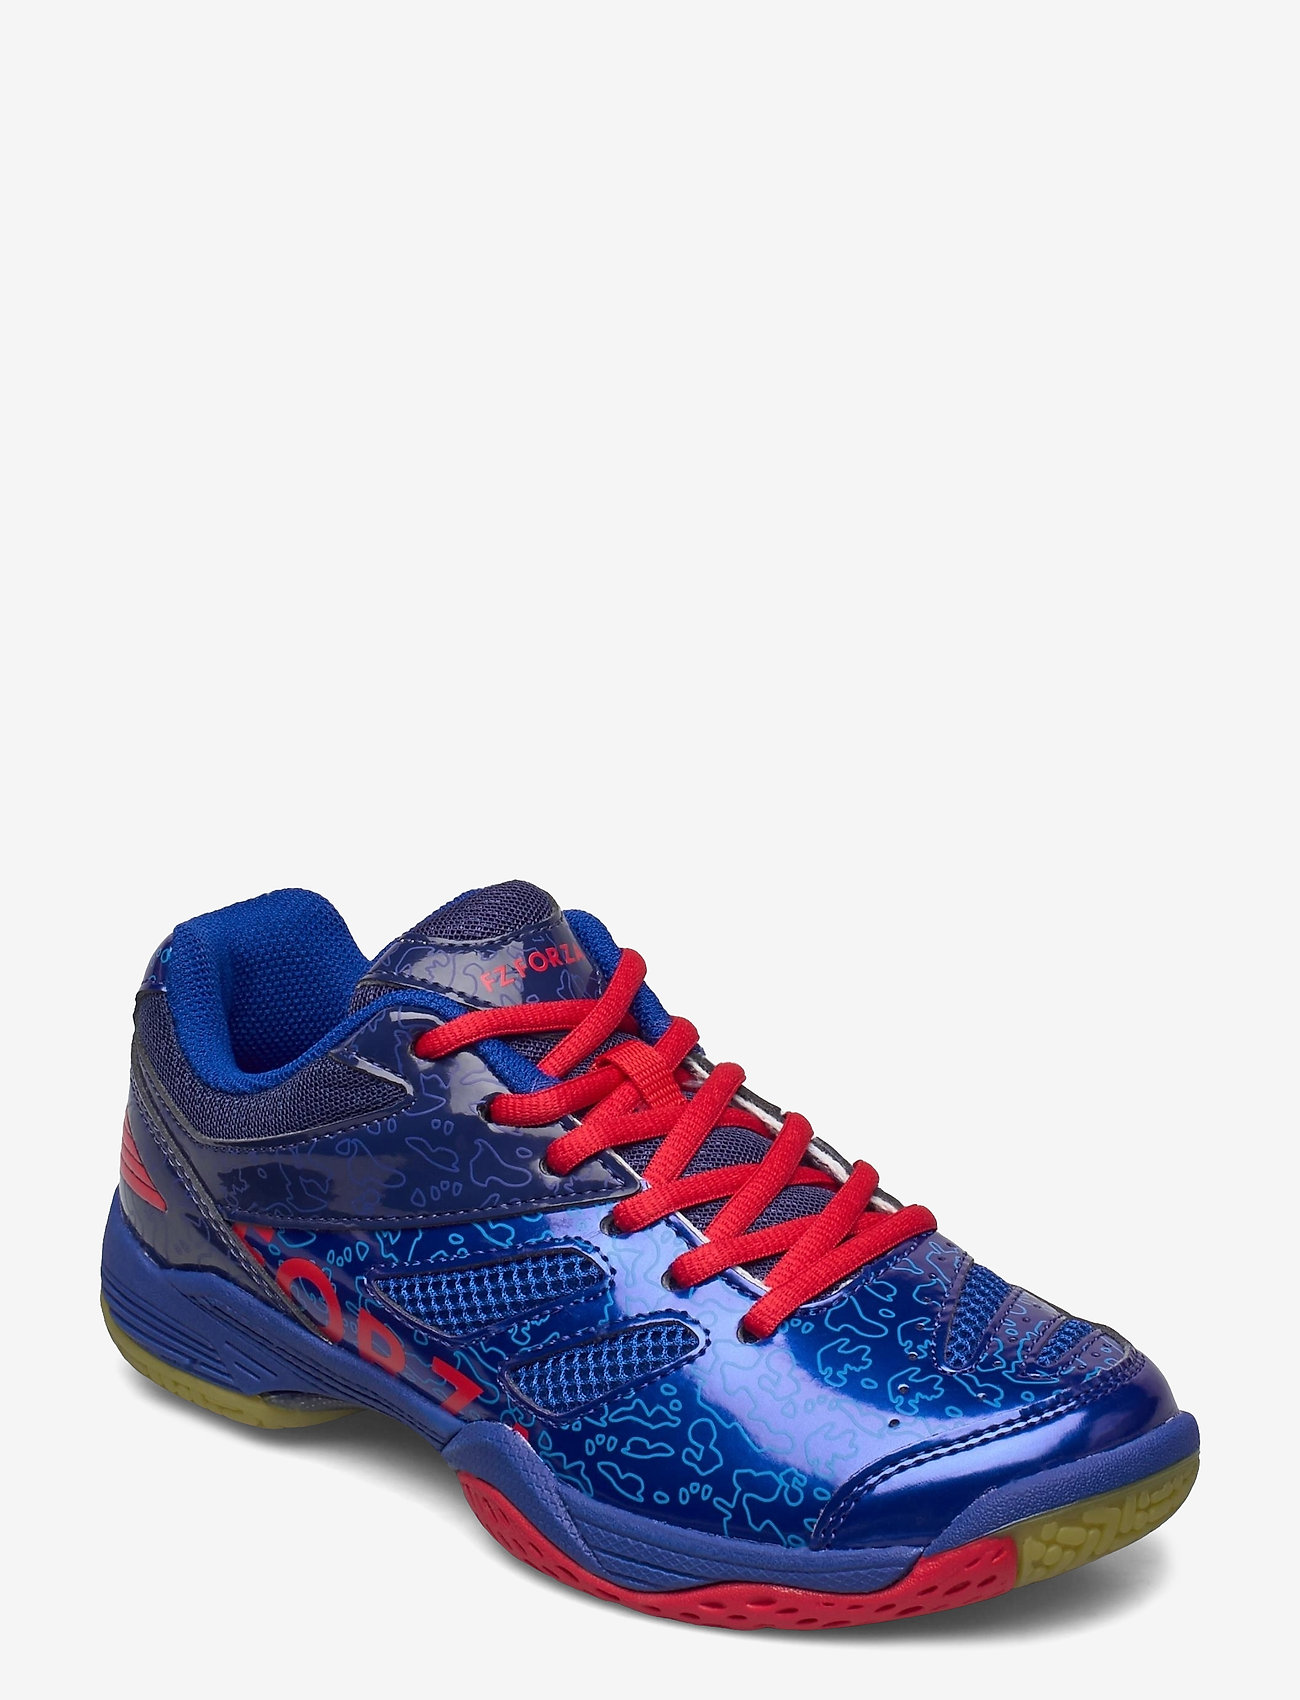 FZ Forza - Court flyer shoes - ketsjersportsko - 01142 electric blue - 1